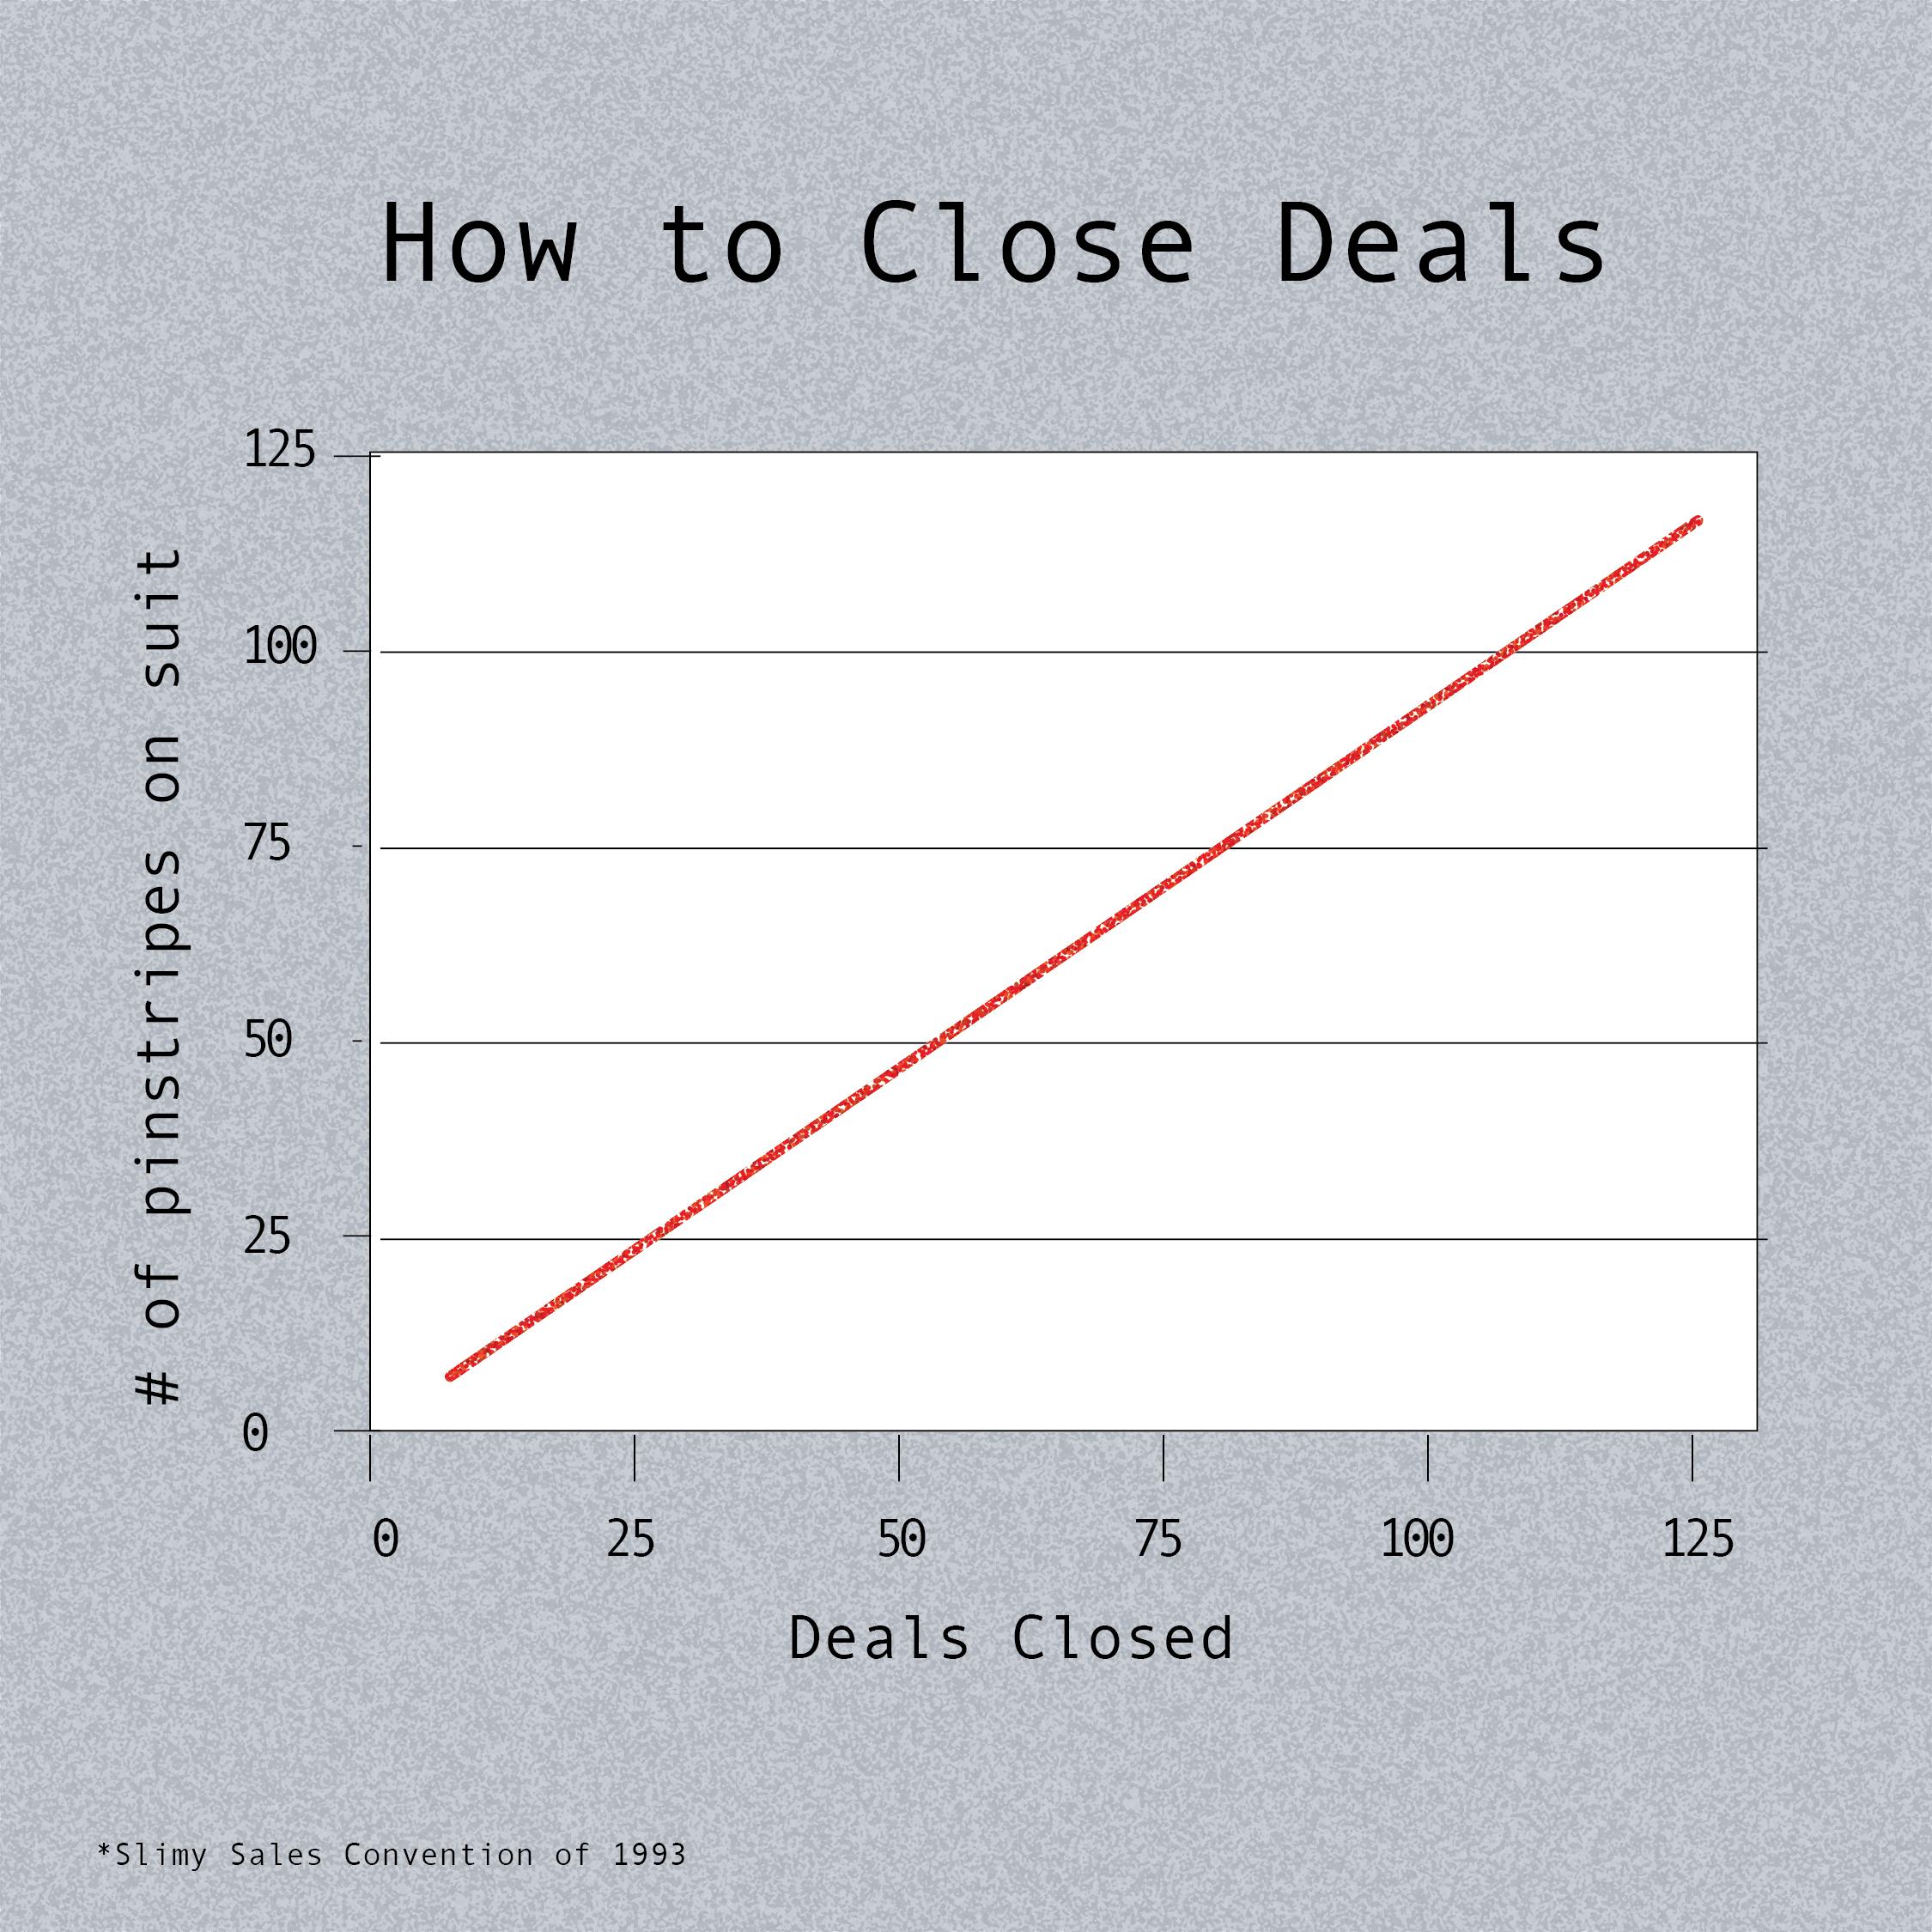 SlimySales_Charts_ChartsGraphs3-05.png